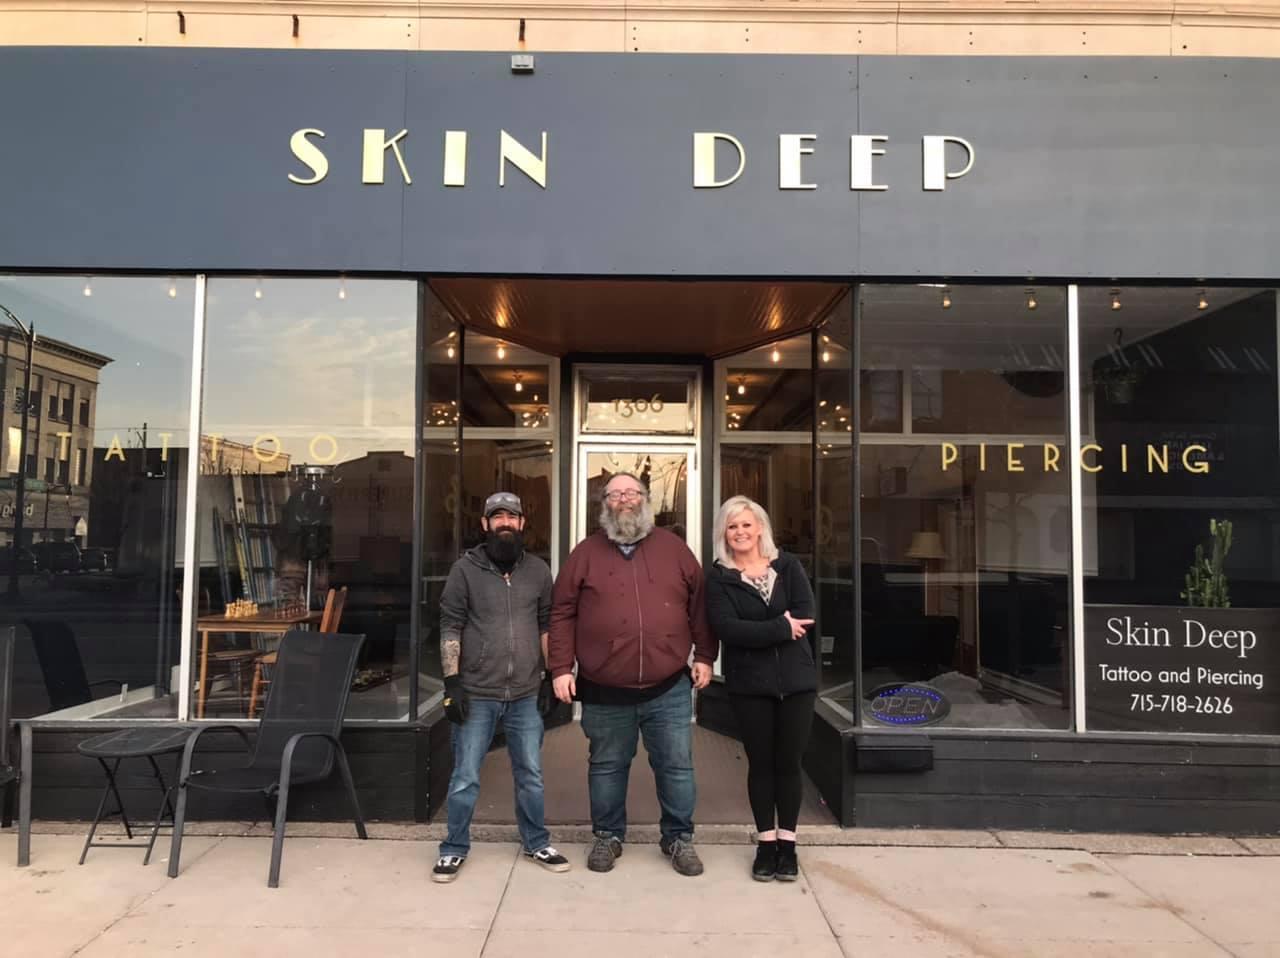 Skin Deep storefront